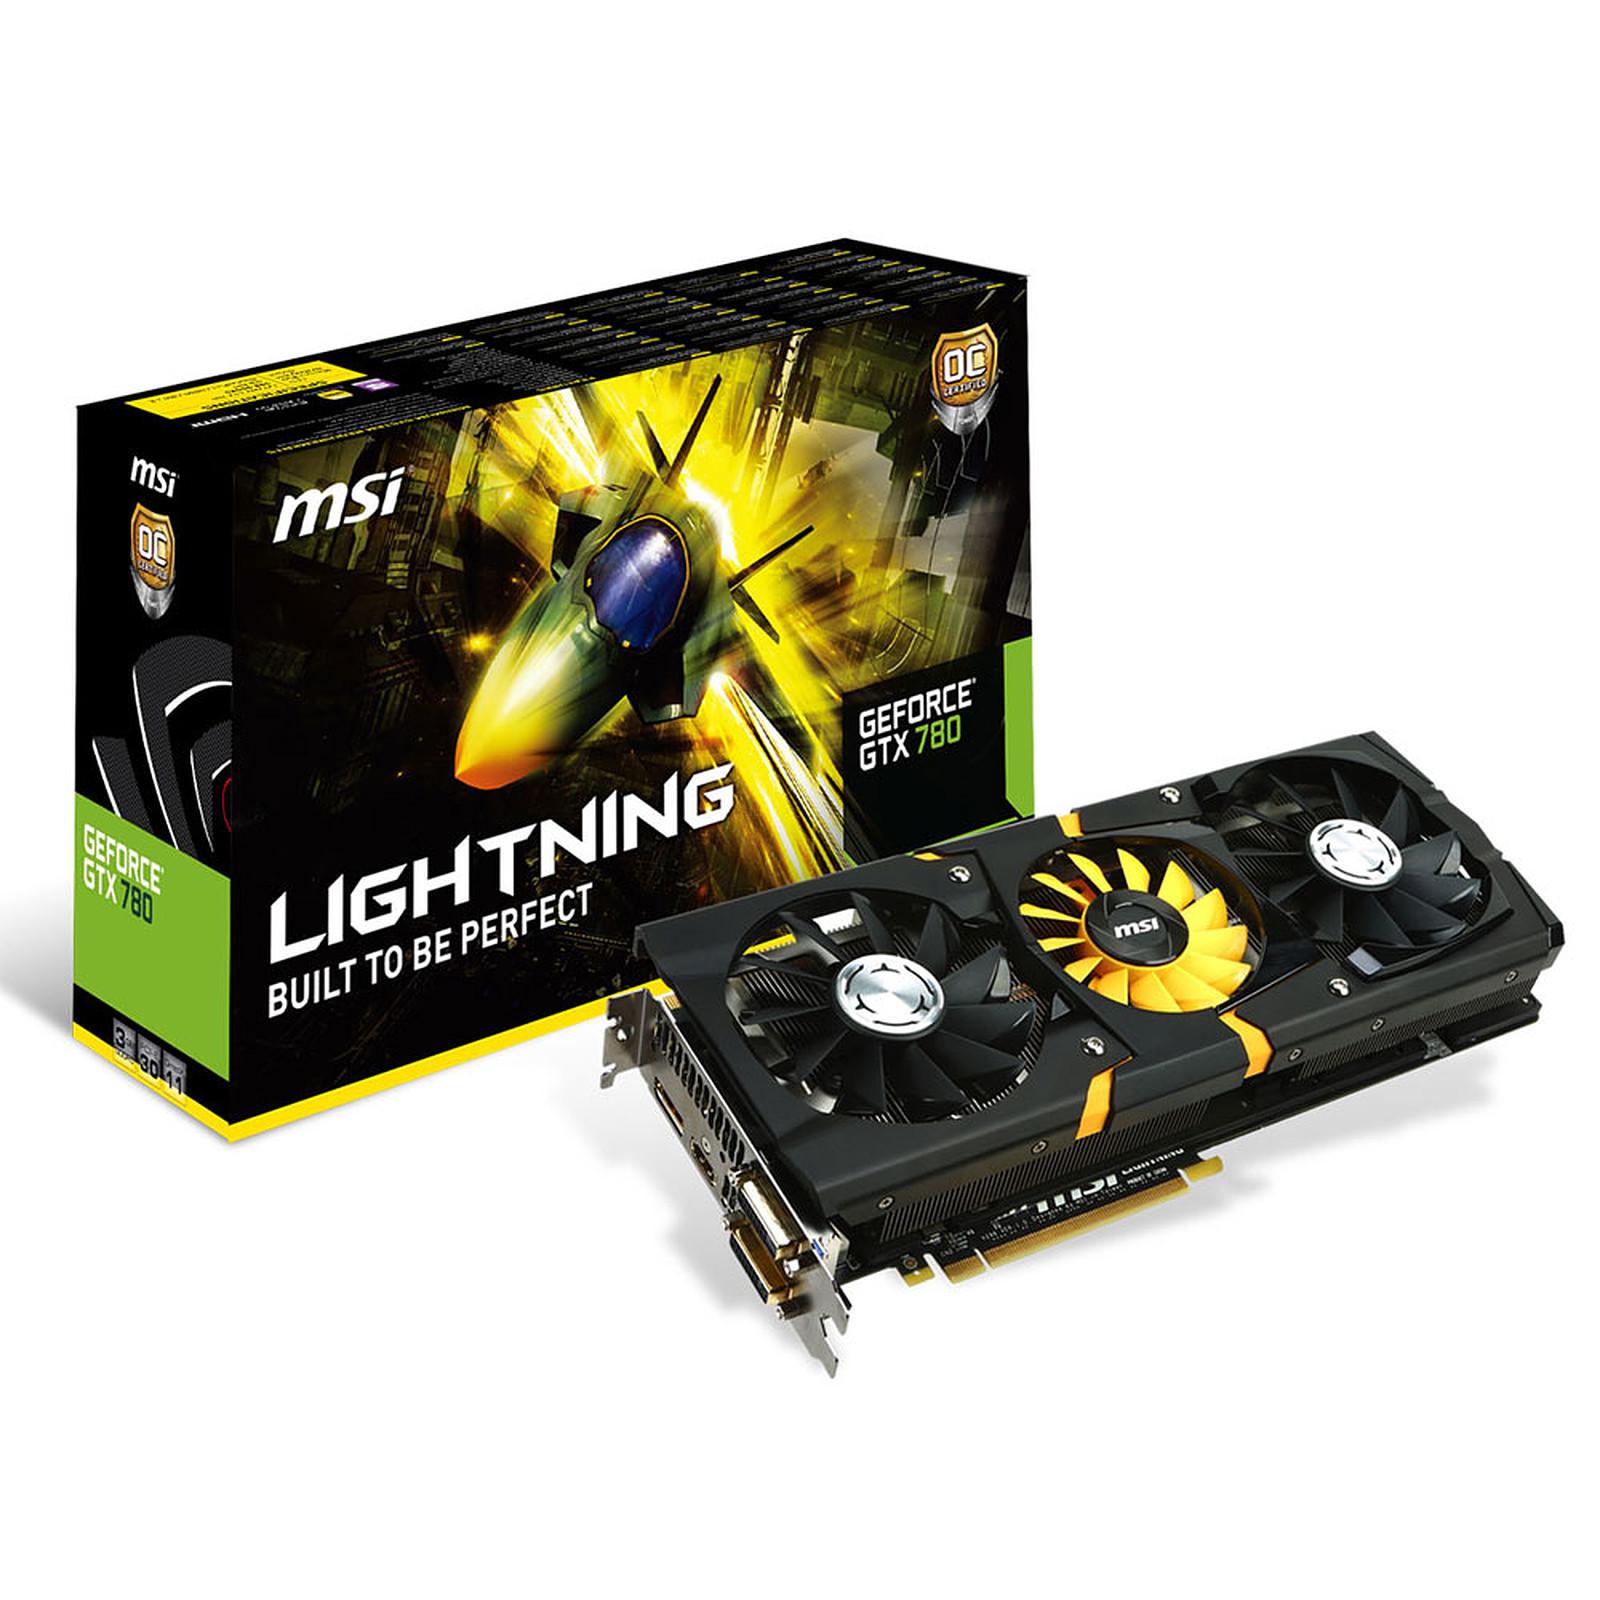 MSI GeForce GTX 780 N780 LIGHTNING 3 Go